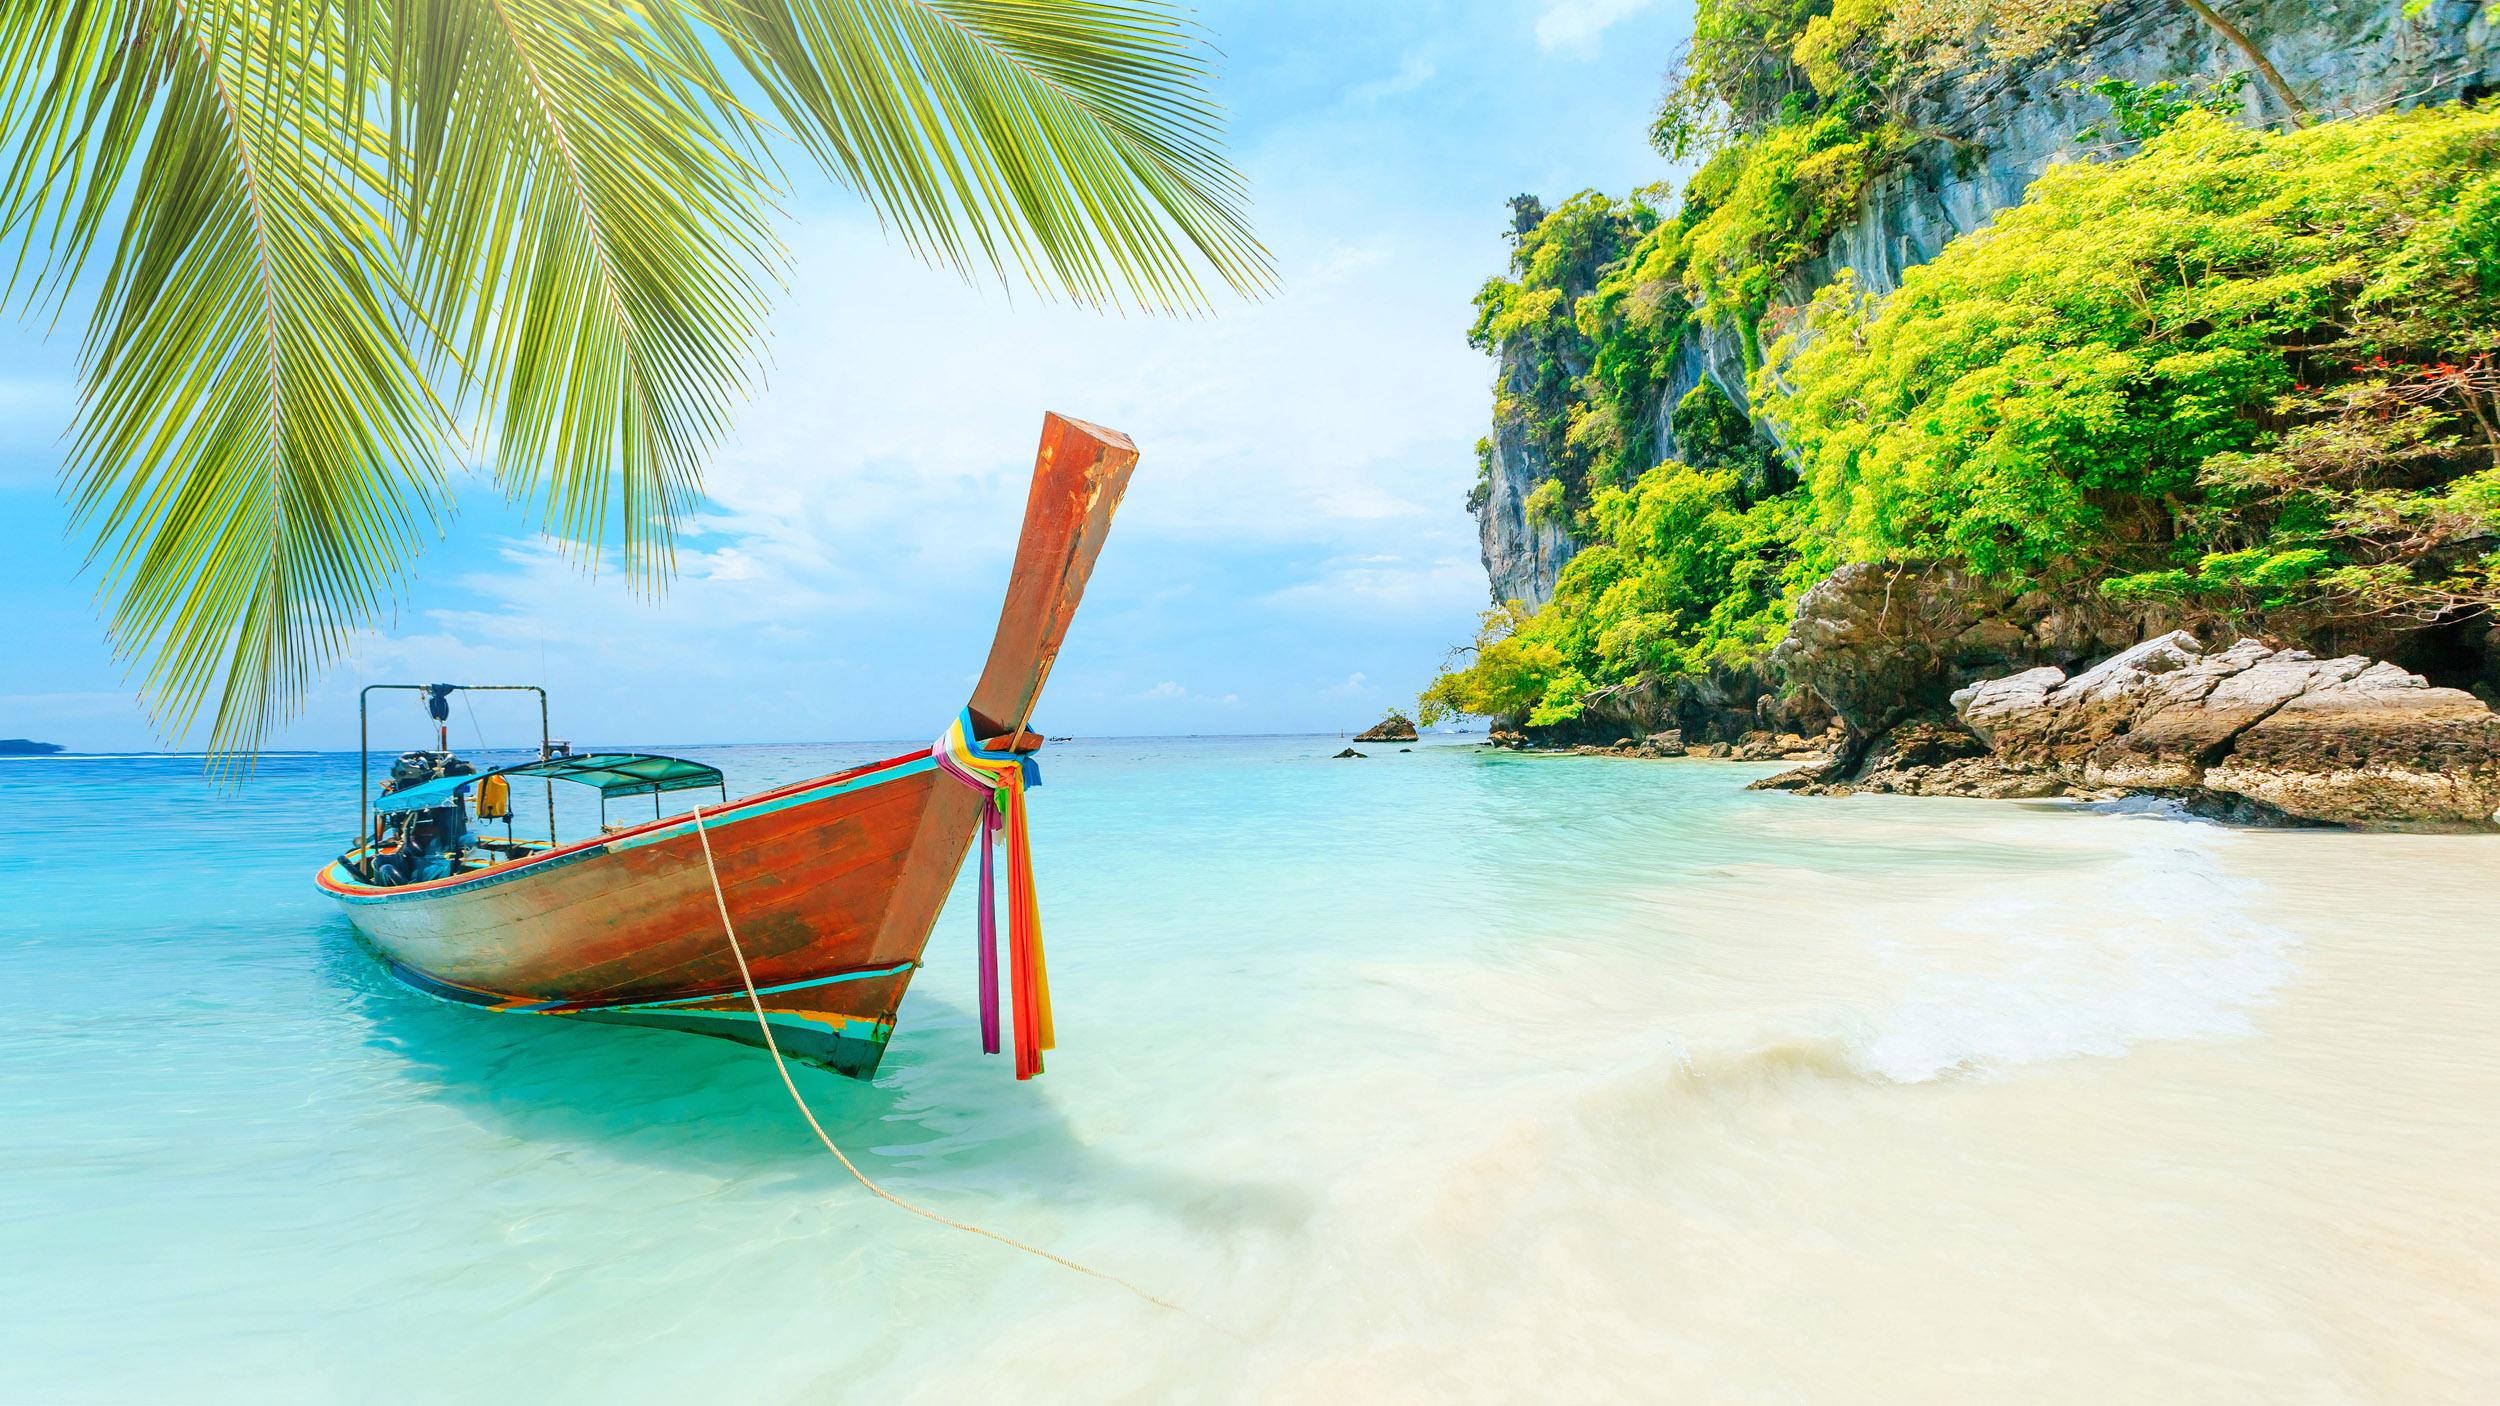 Thailand reopen Phuket, their most touristic island, with a courageous program called Phuket Sandbox